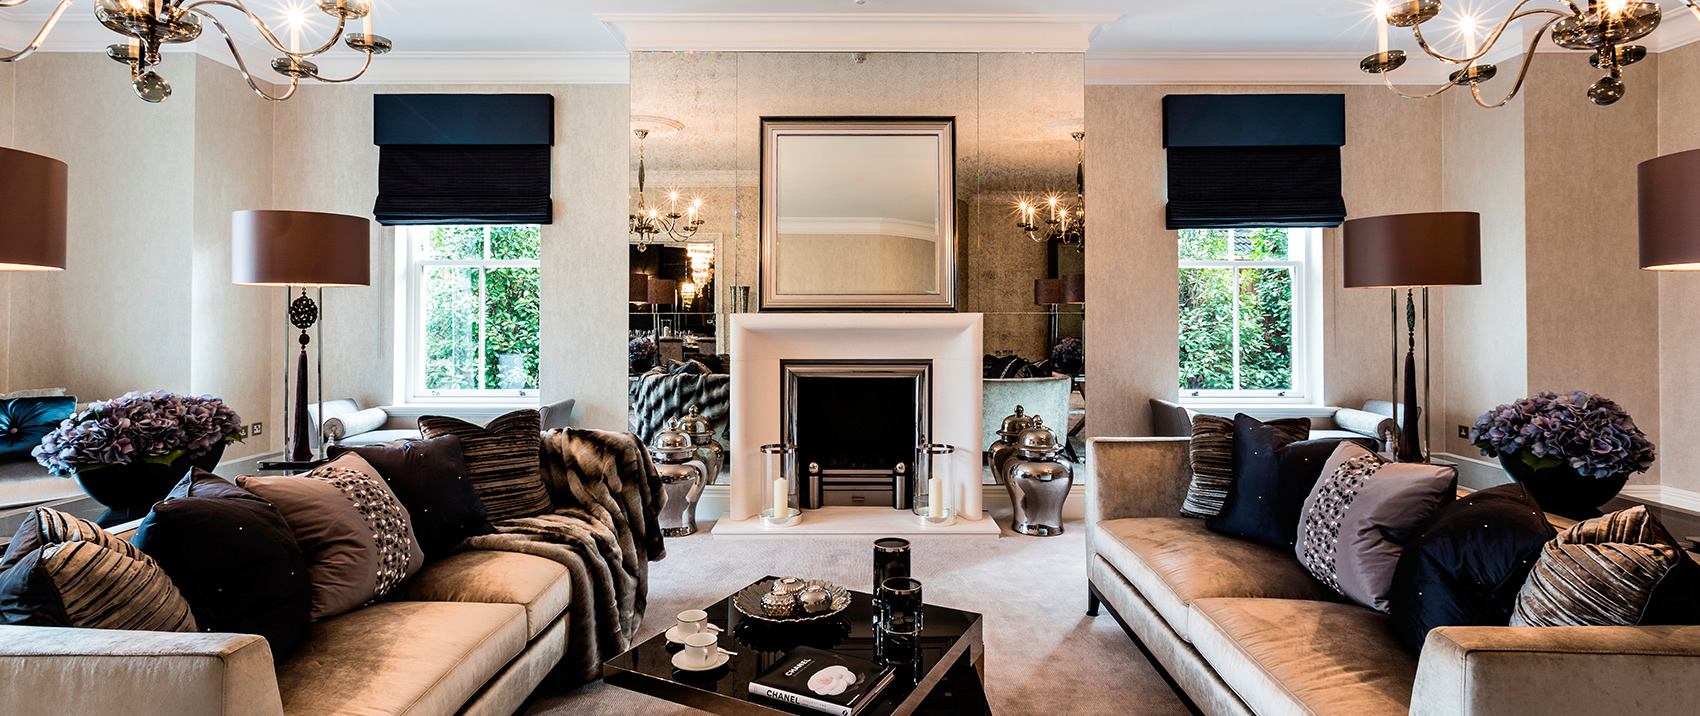 Concept Interiors Weybridge Surrey